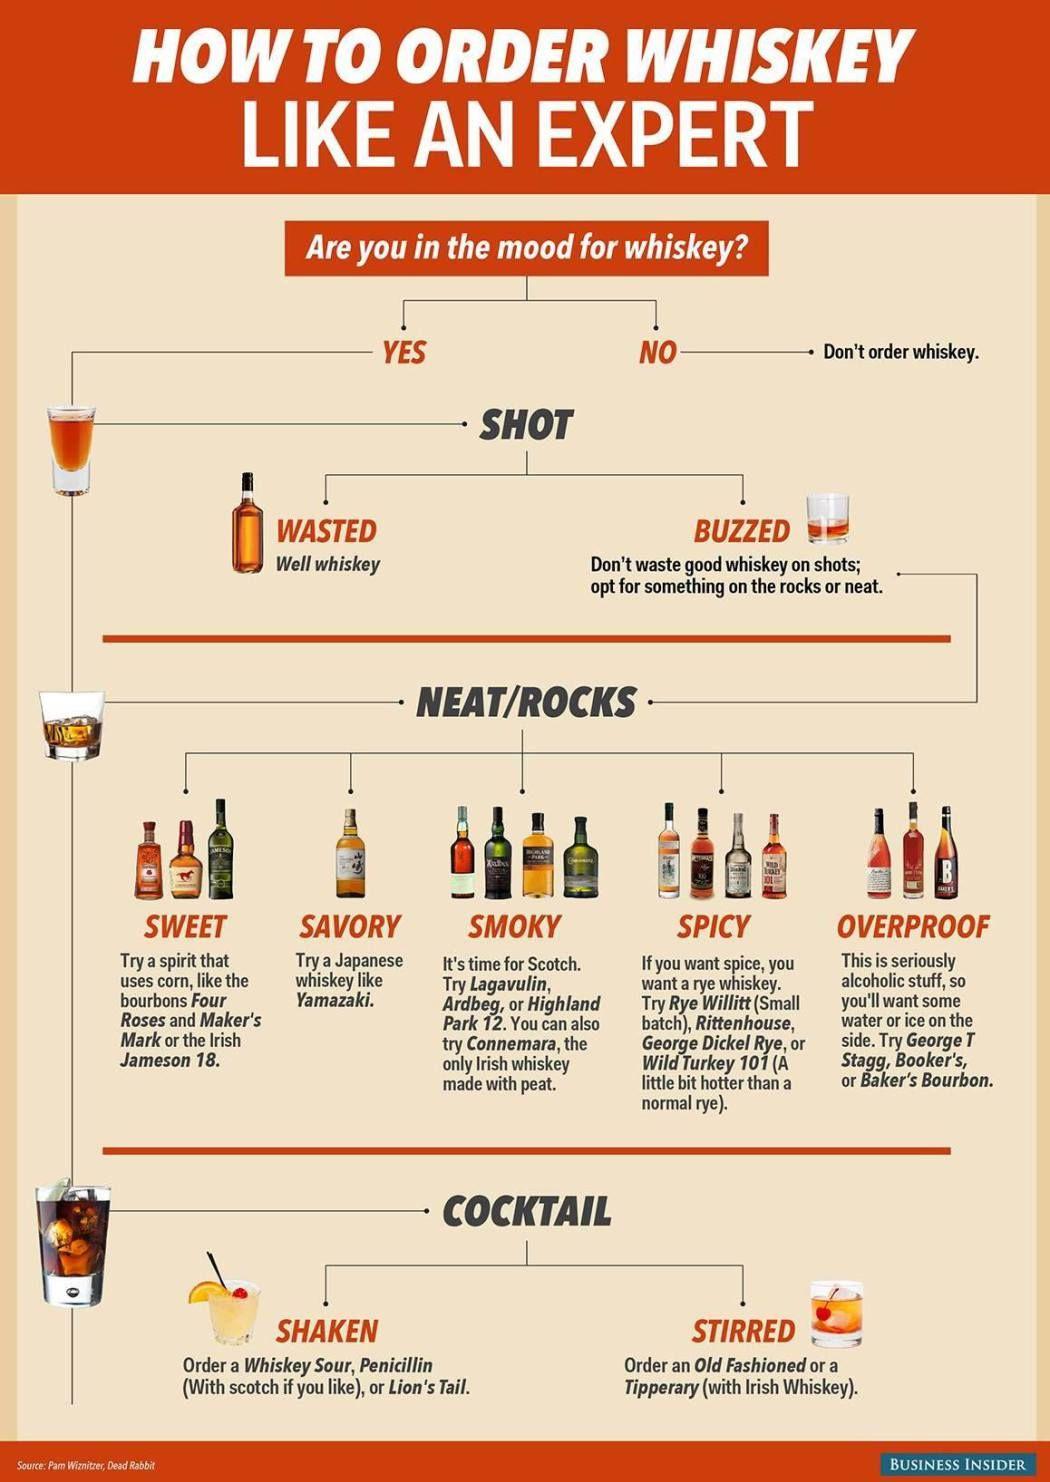 whiskey ordering info graphic wine spirits pinterest bar